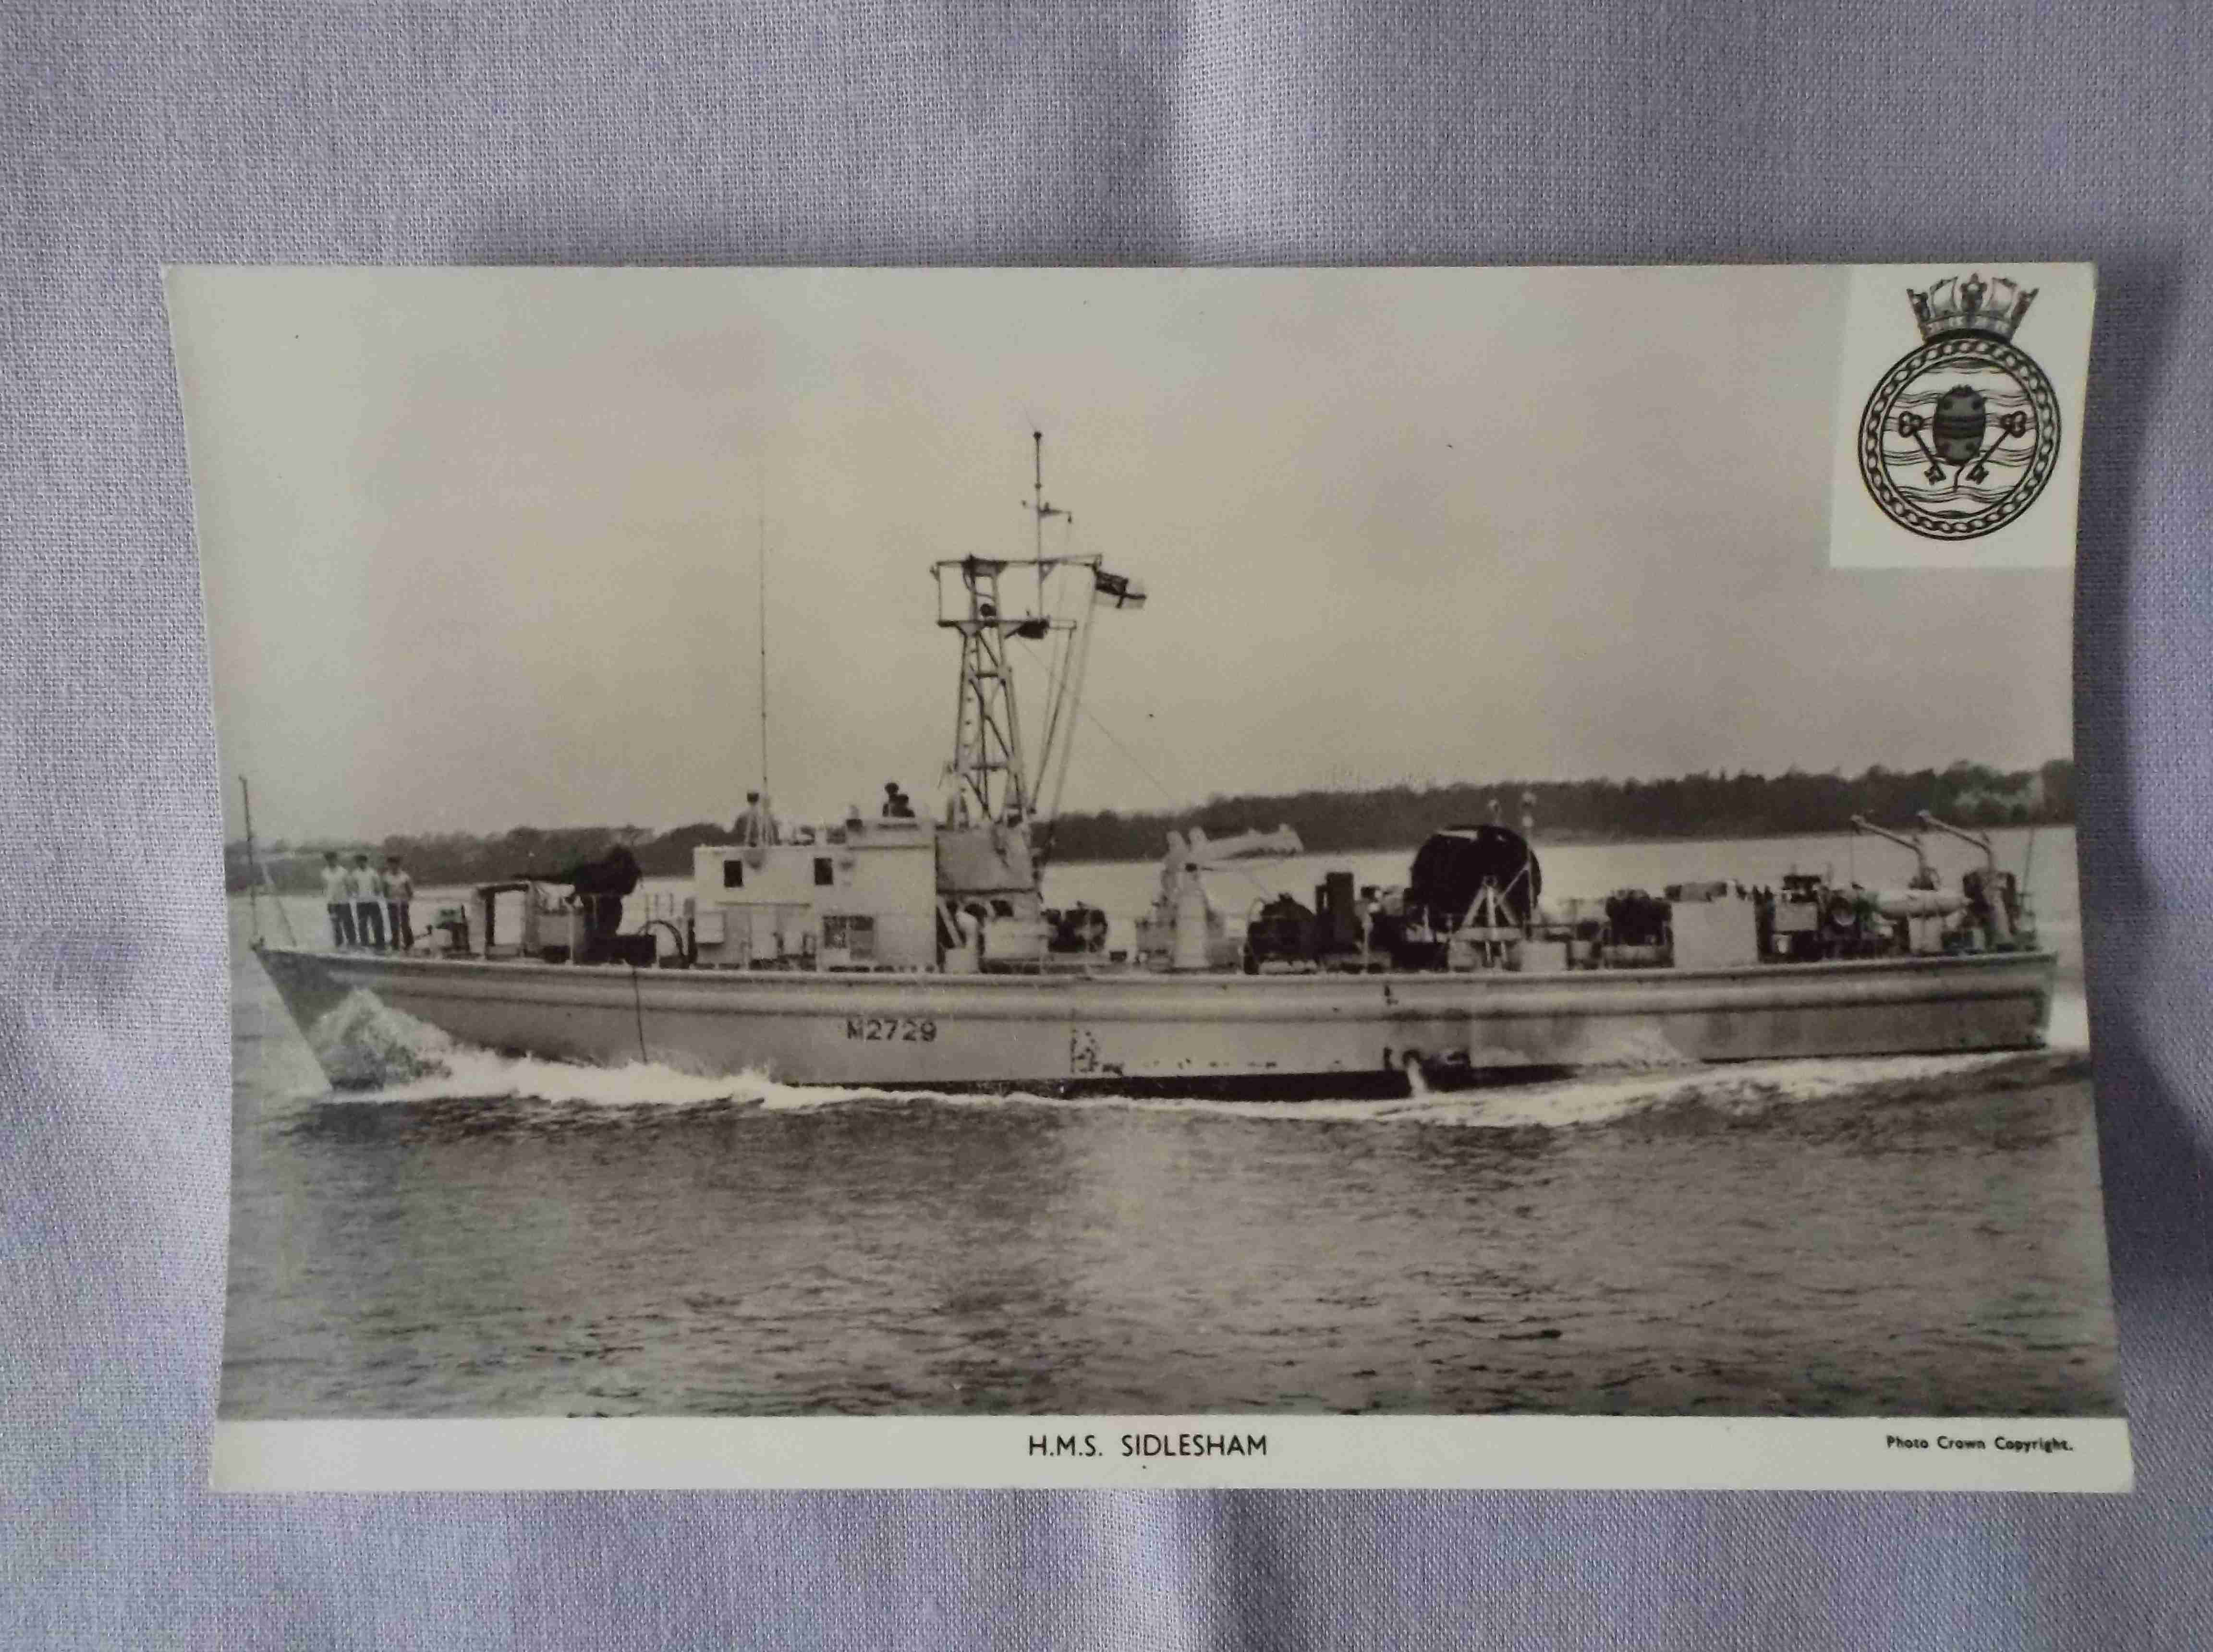 POSTCARD SIZE PHOTOGRAPH OF THE ROYAL NAVAL VESSEL HMS SIDLESHAM